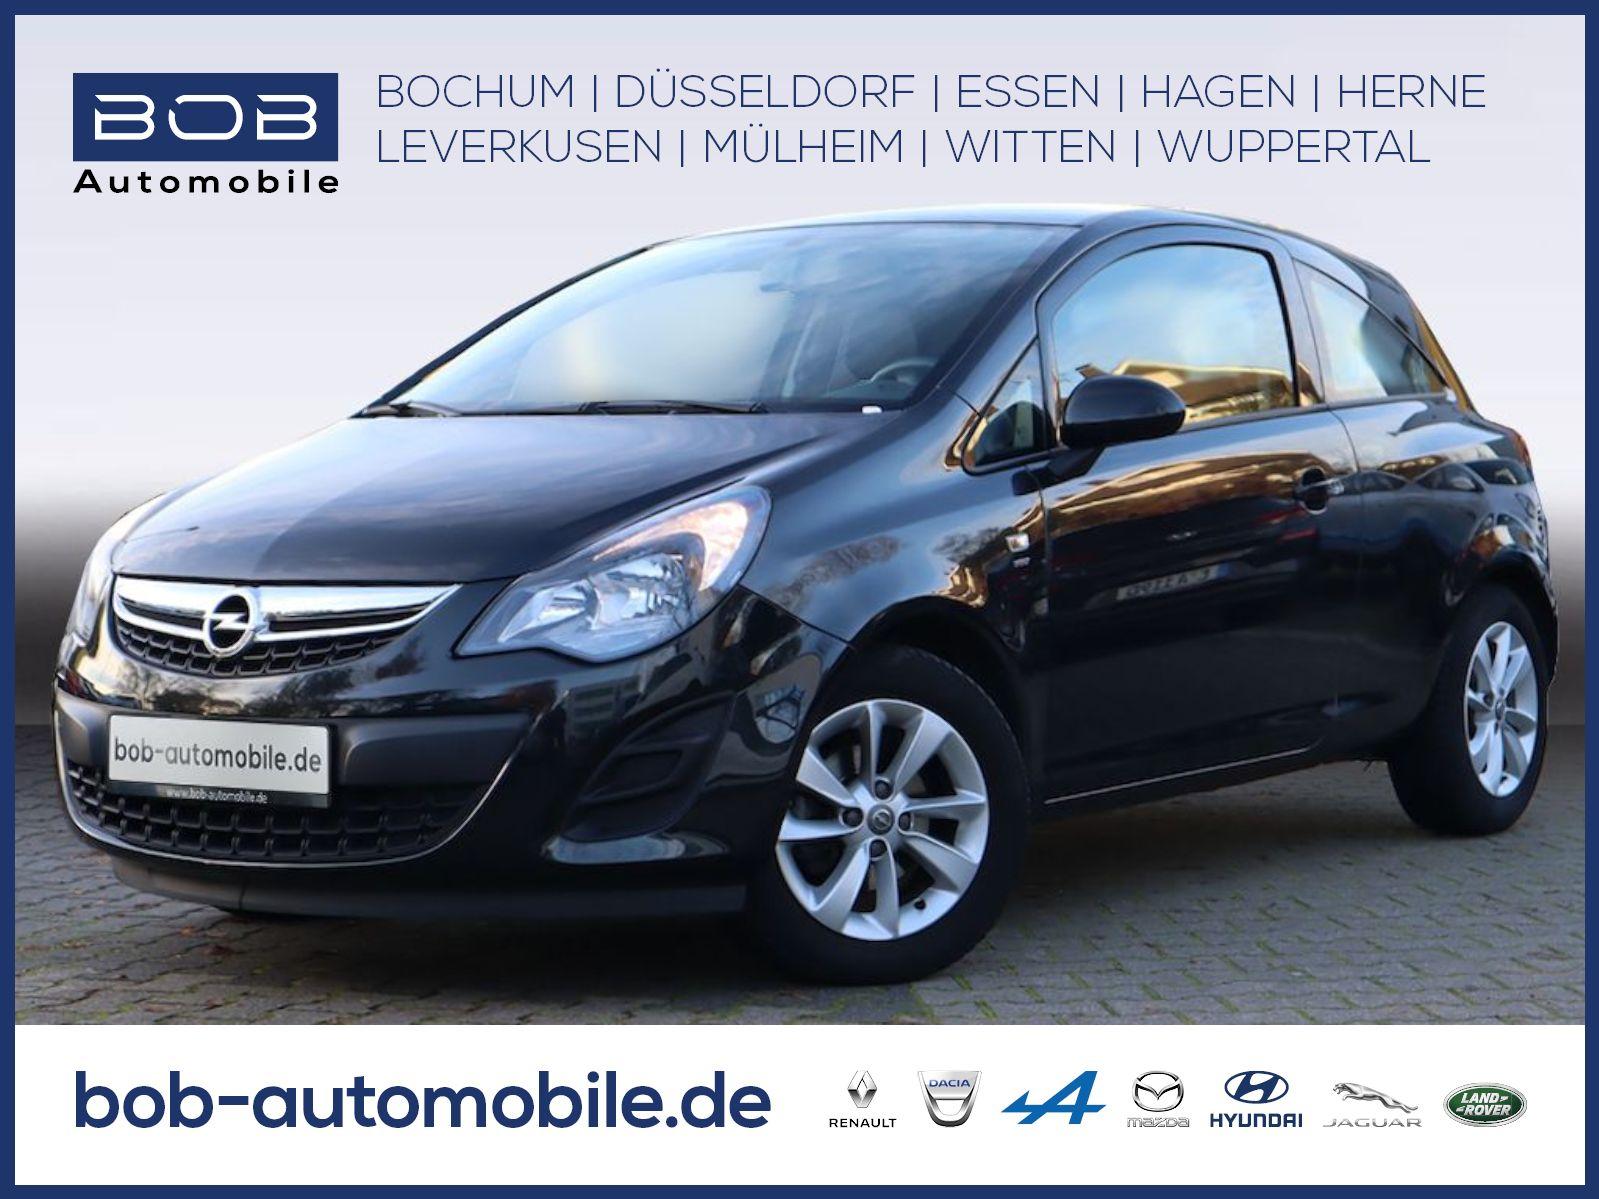 Opel Corsa 1.4 Energy KLIMA LM-Felgen eFH ESP, Jahr 2015, Benzin